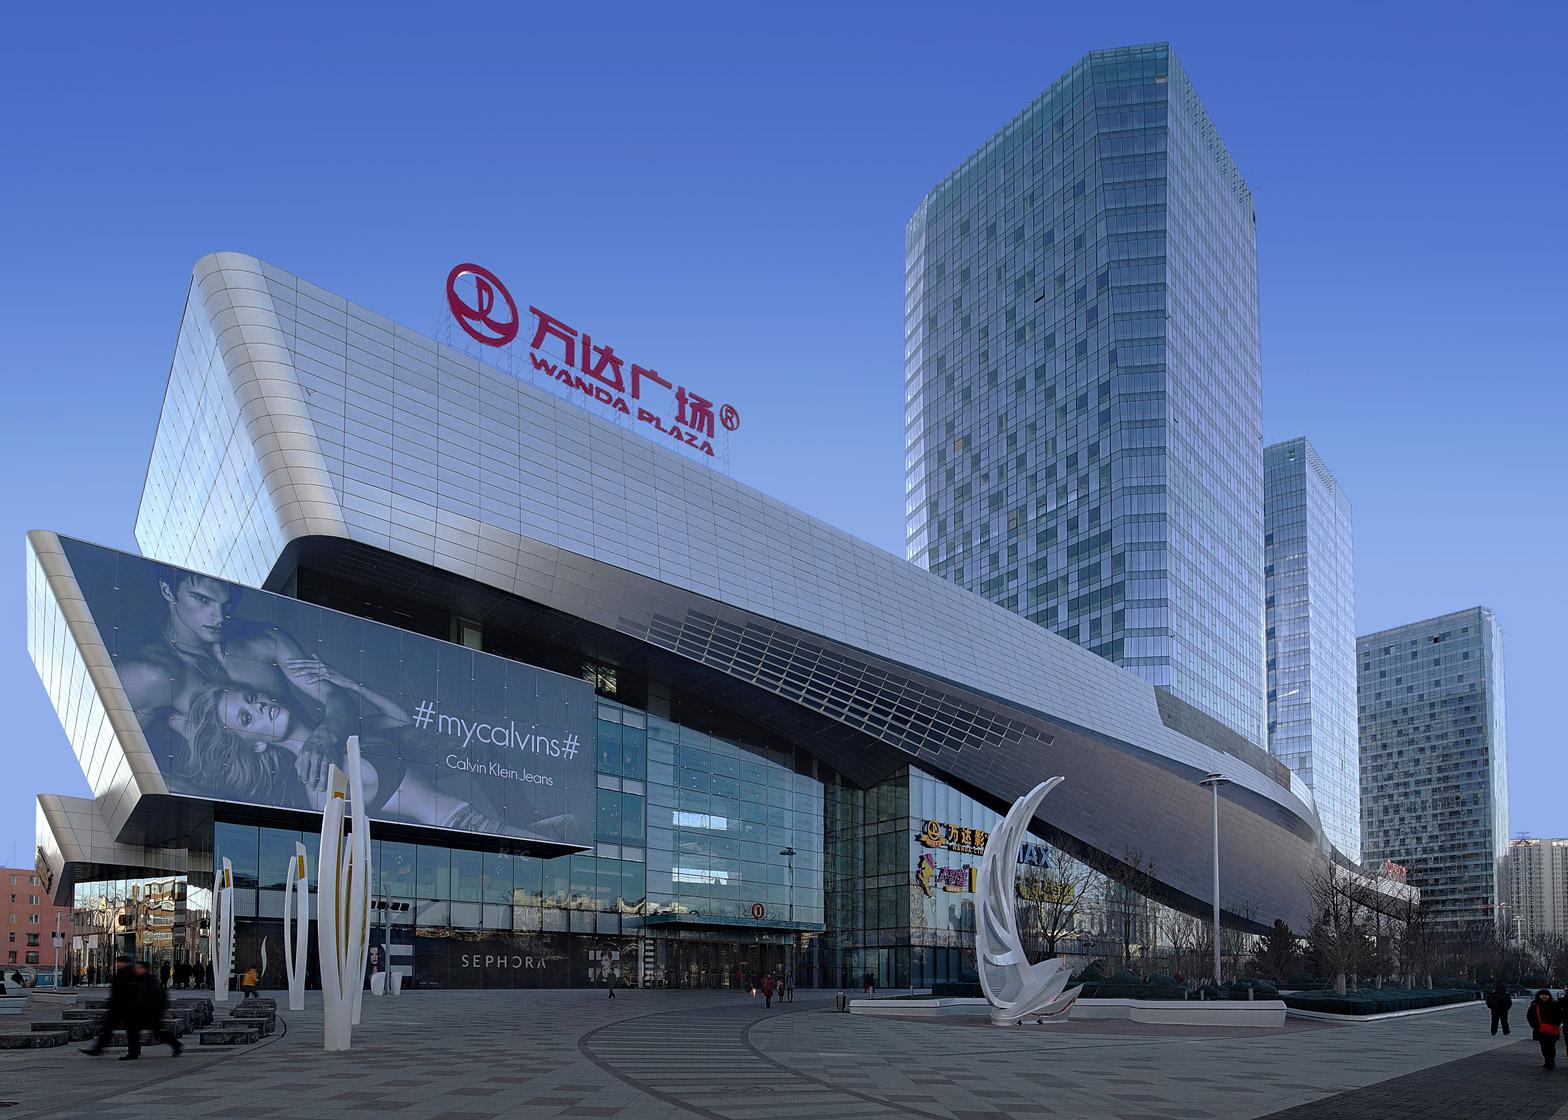 International shopping plaza competition